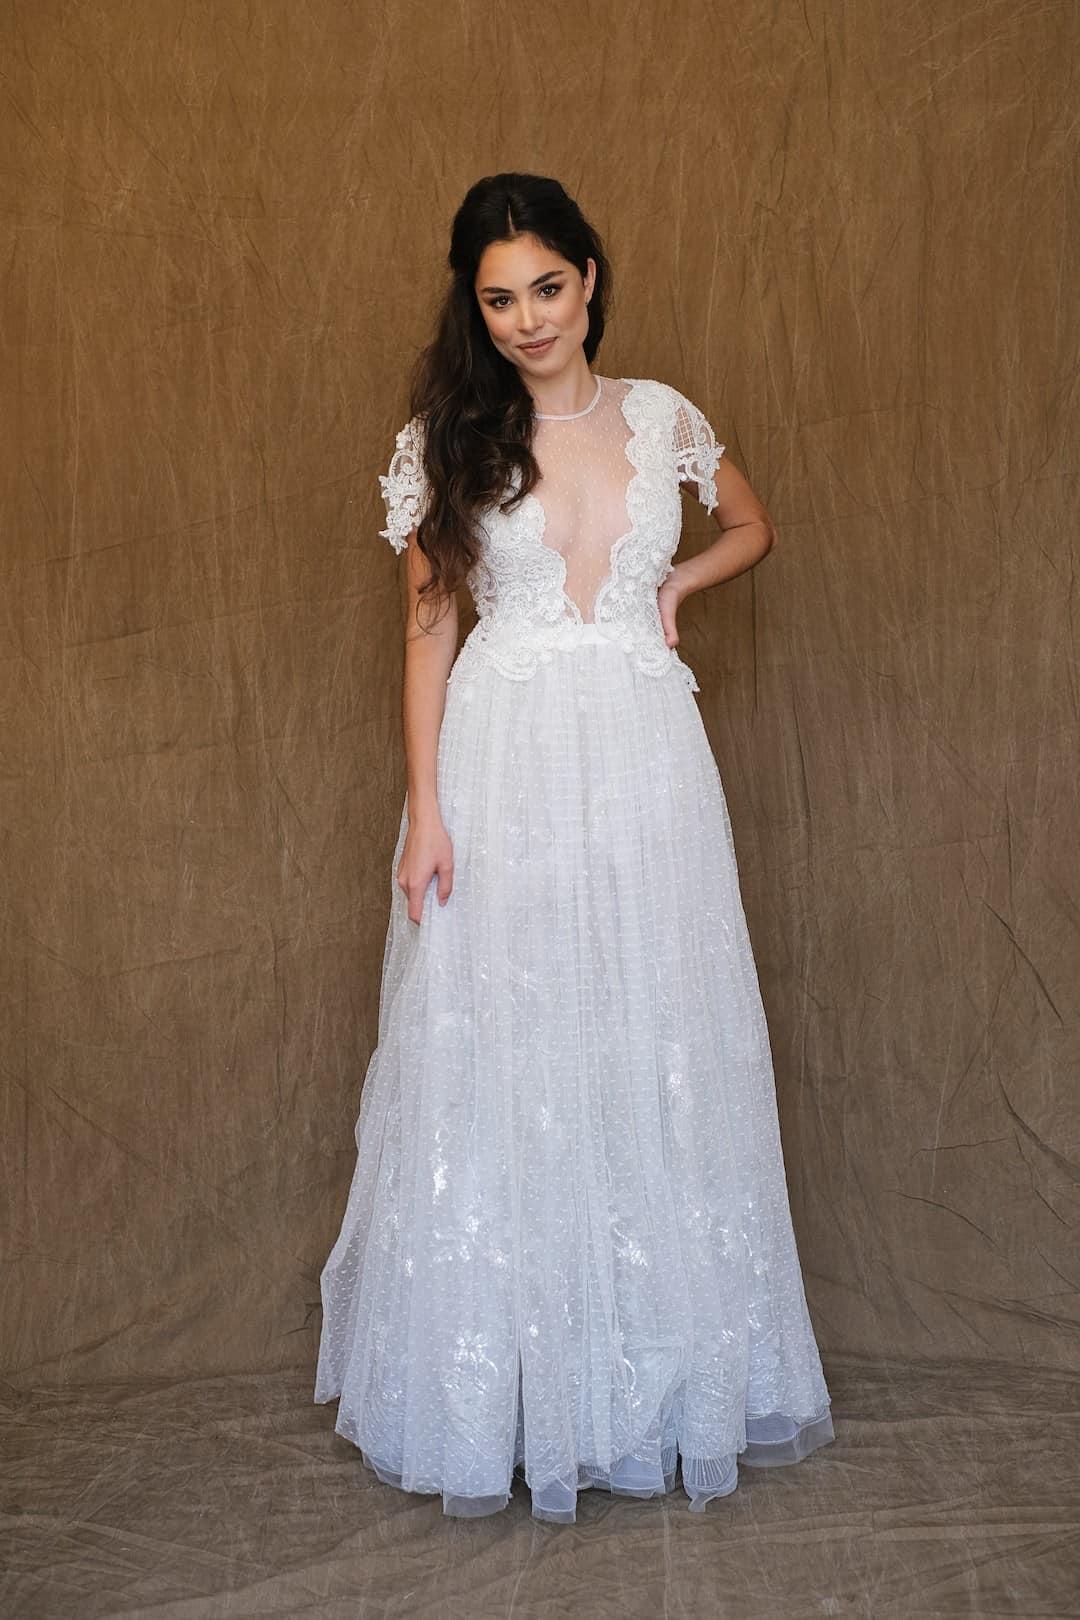 Romantic wedding dress - Marco&Maria - 2017-1007-front